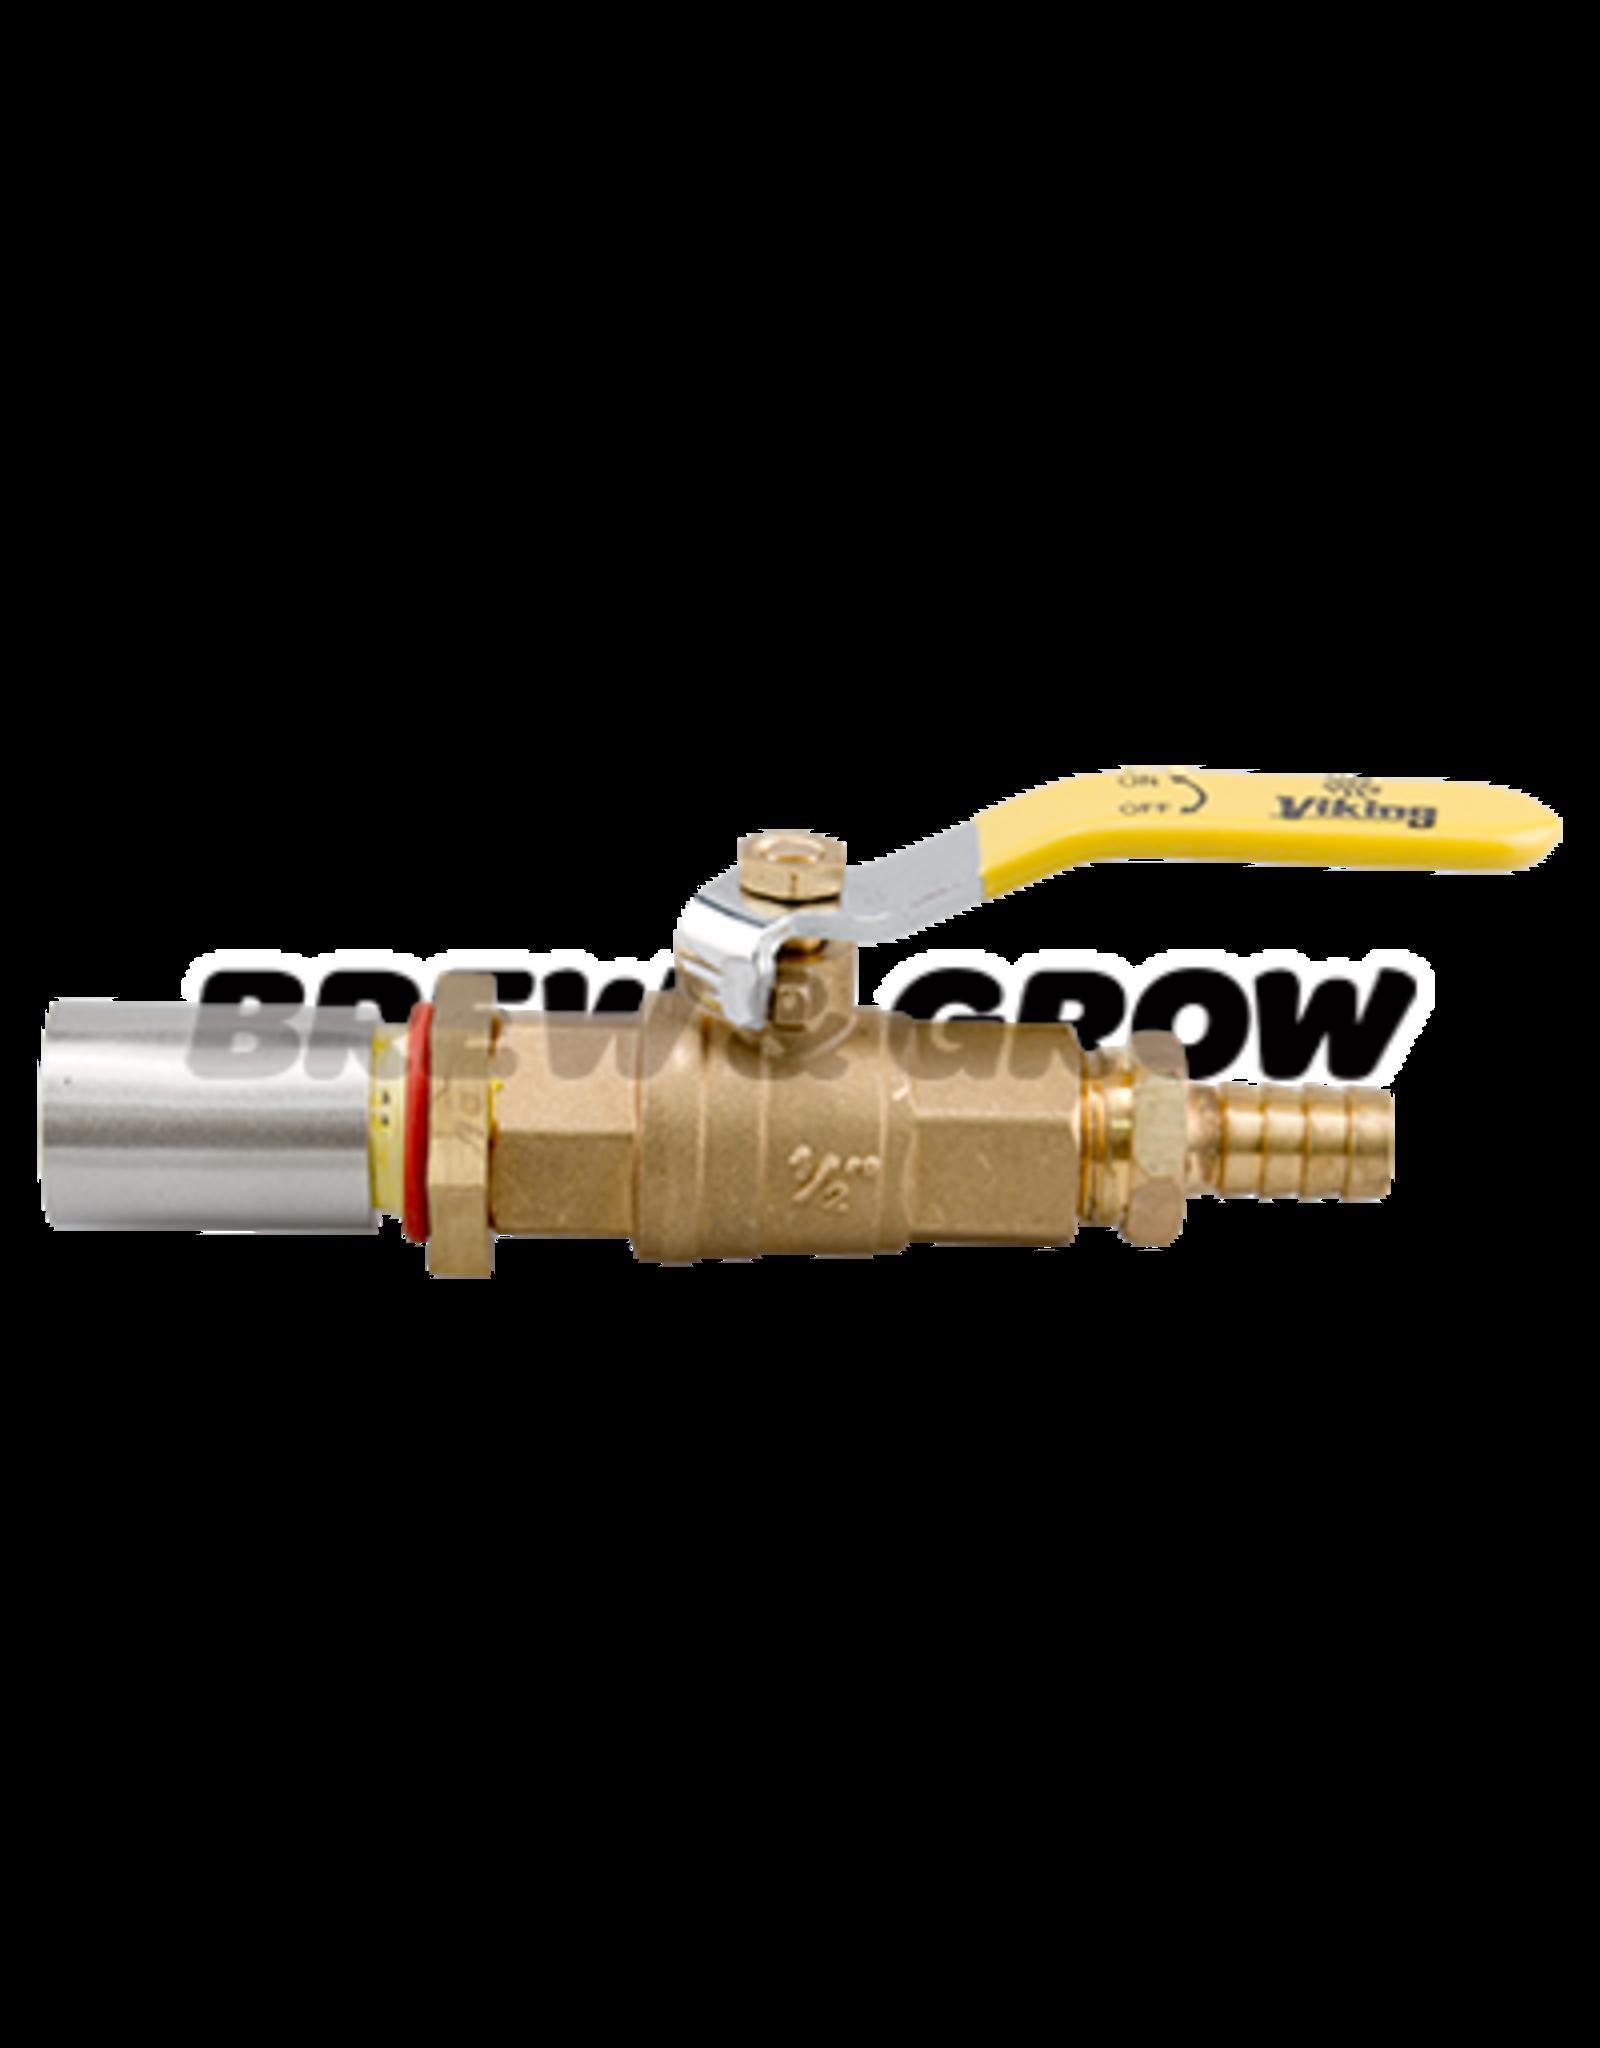 Kettle Conversion Kit - Basic Brass